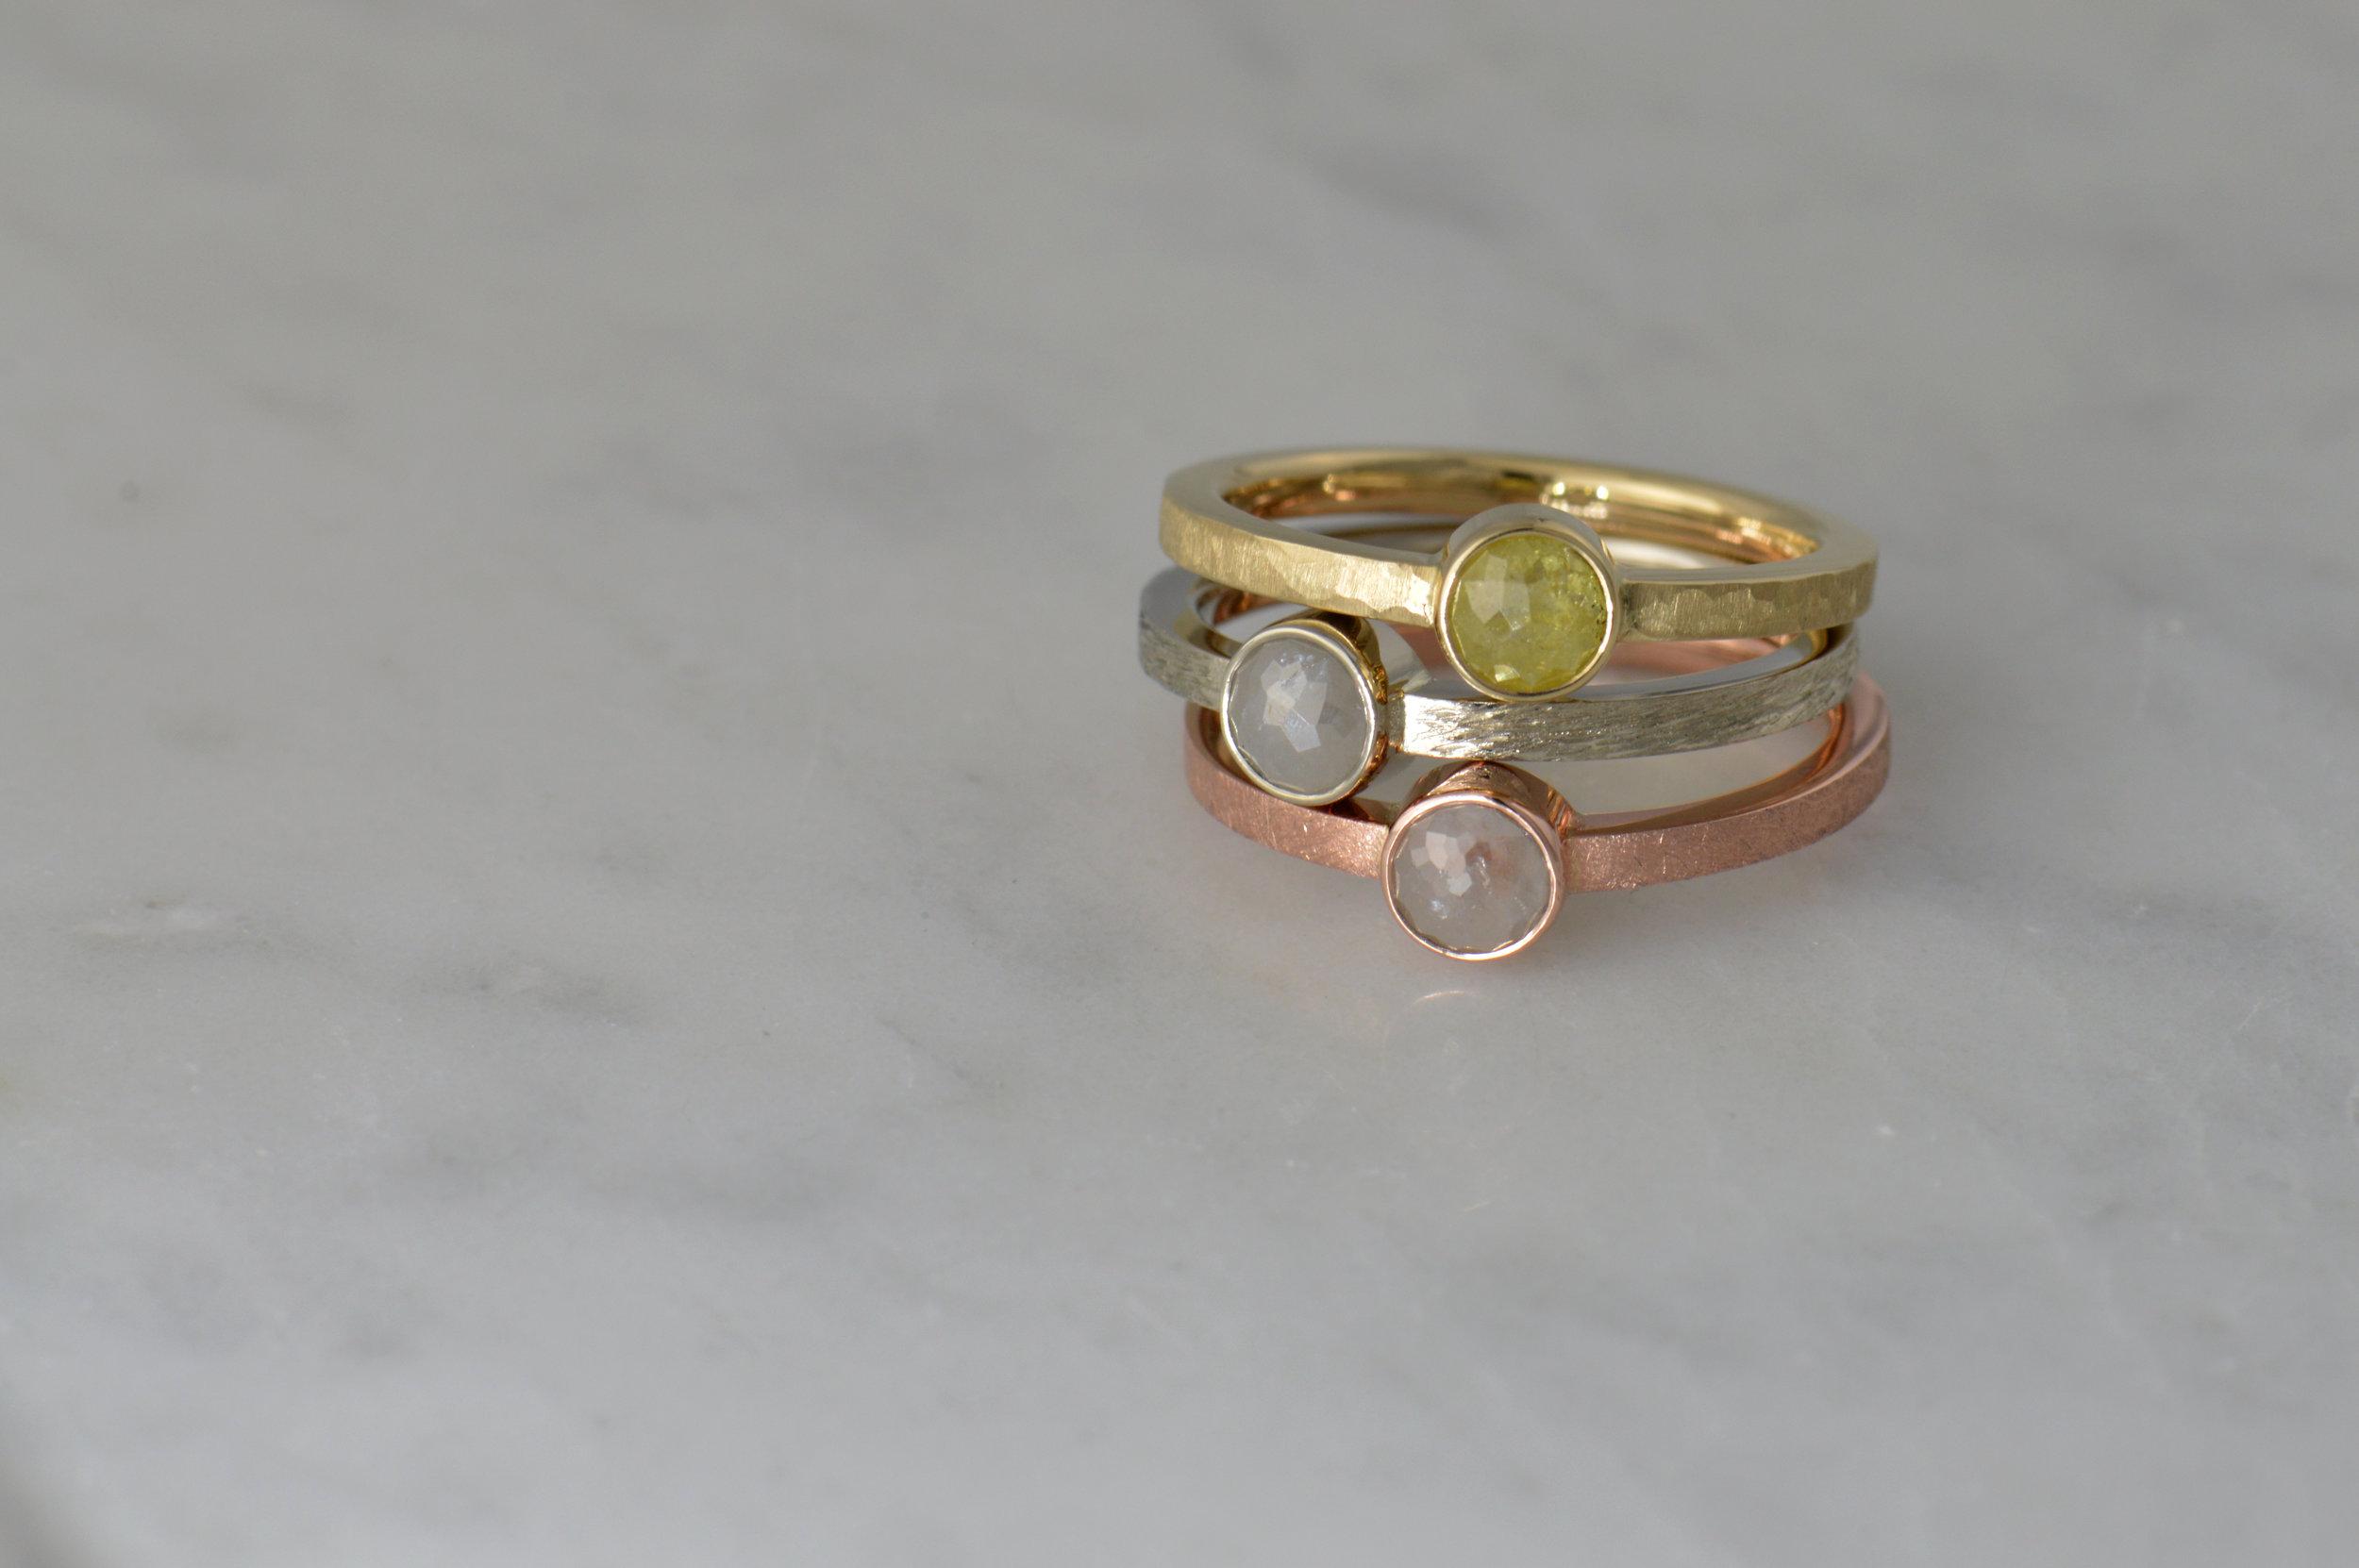 darvier-rose-cut-diamonds-stacking-rings-gold-rustic.jpg